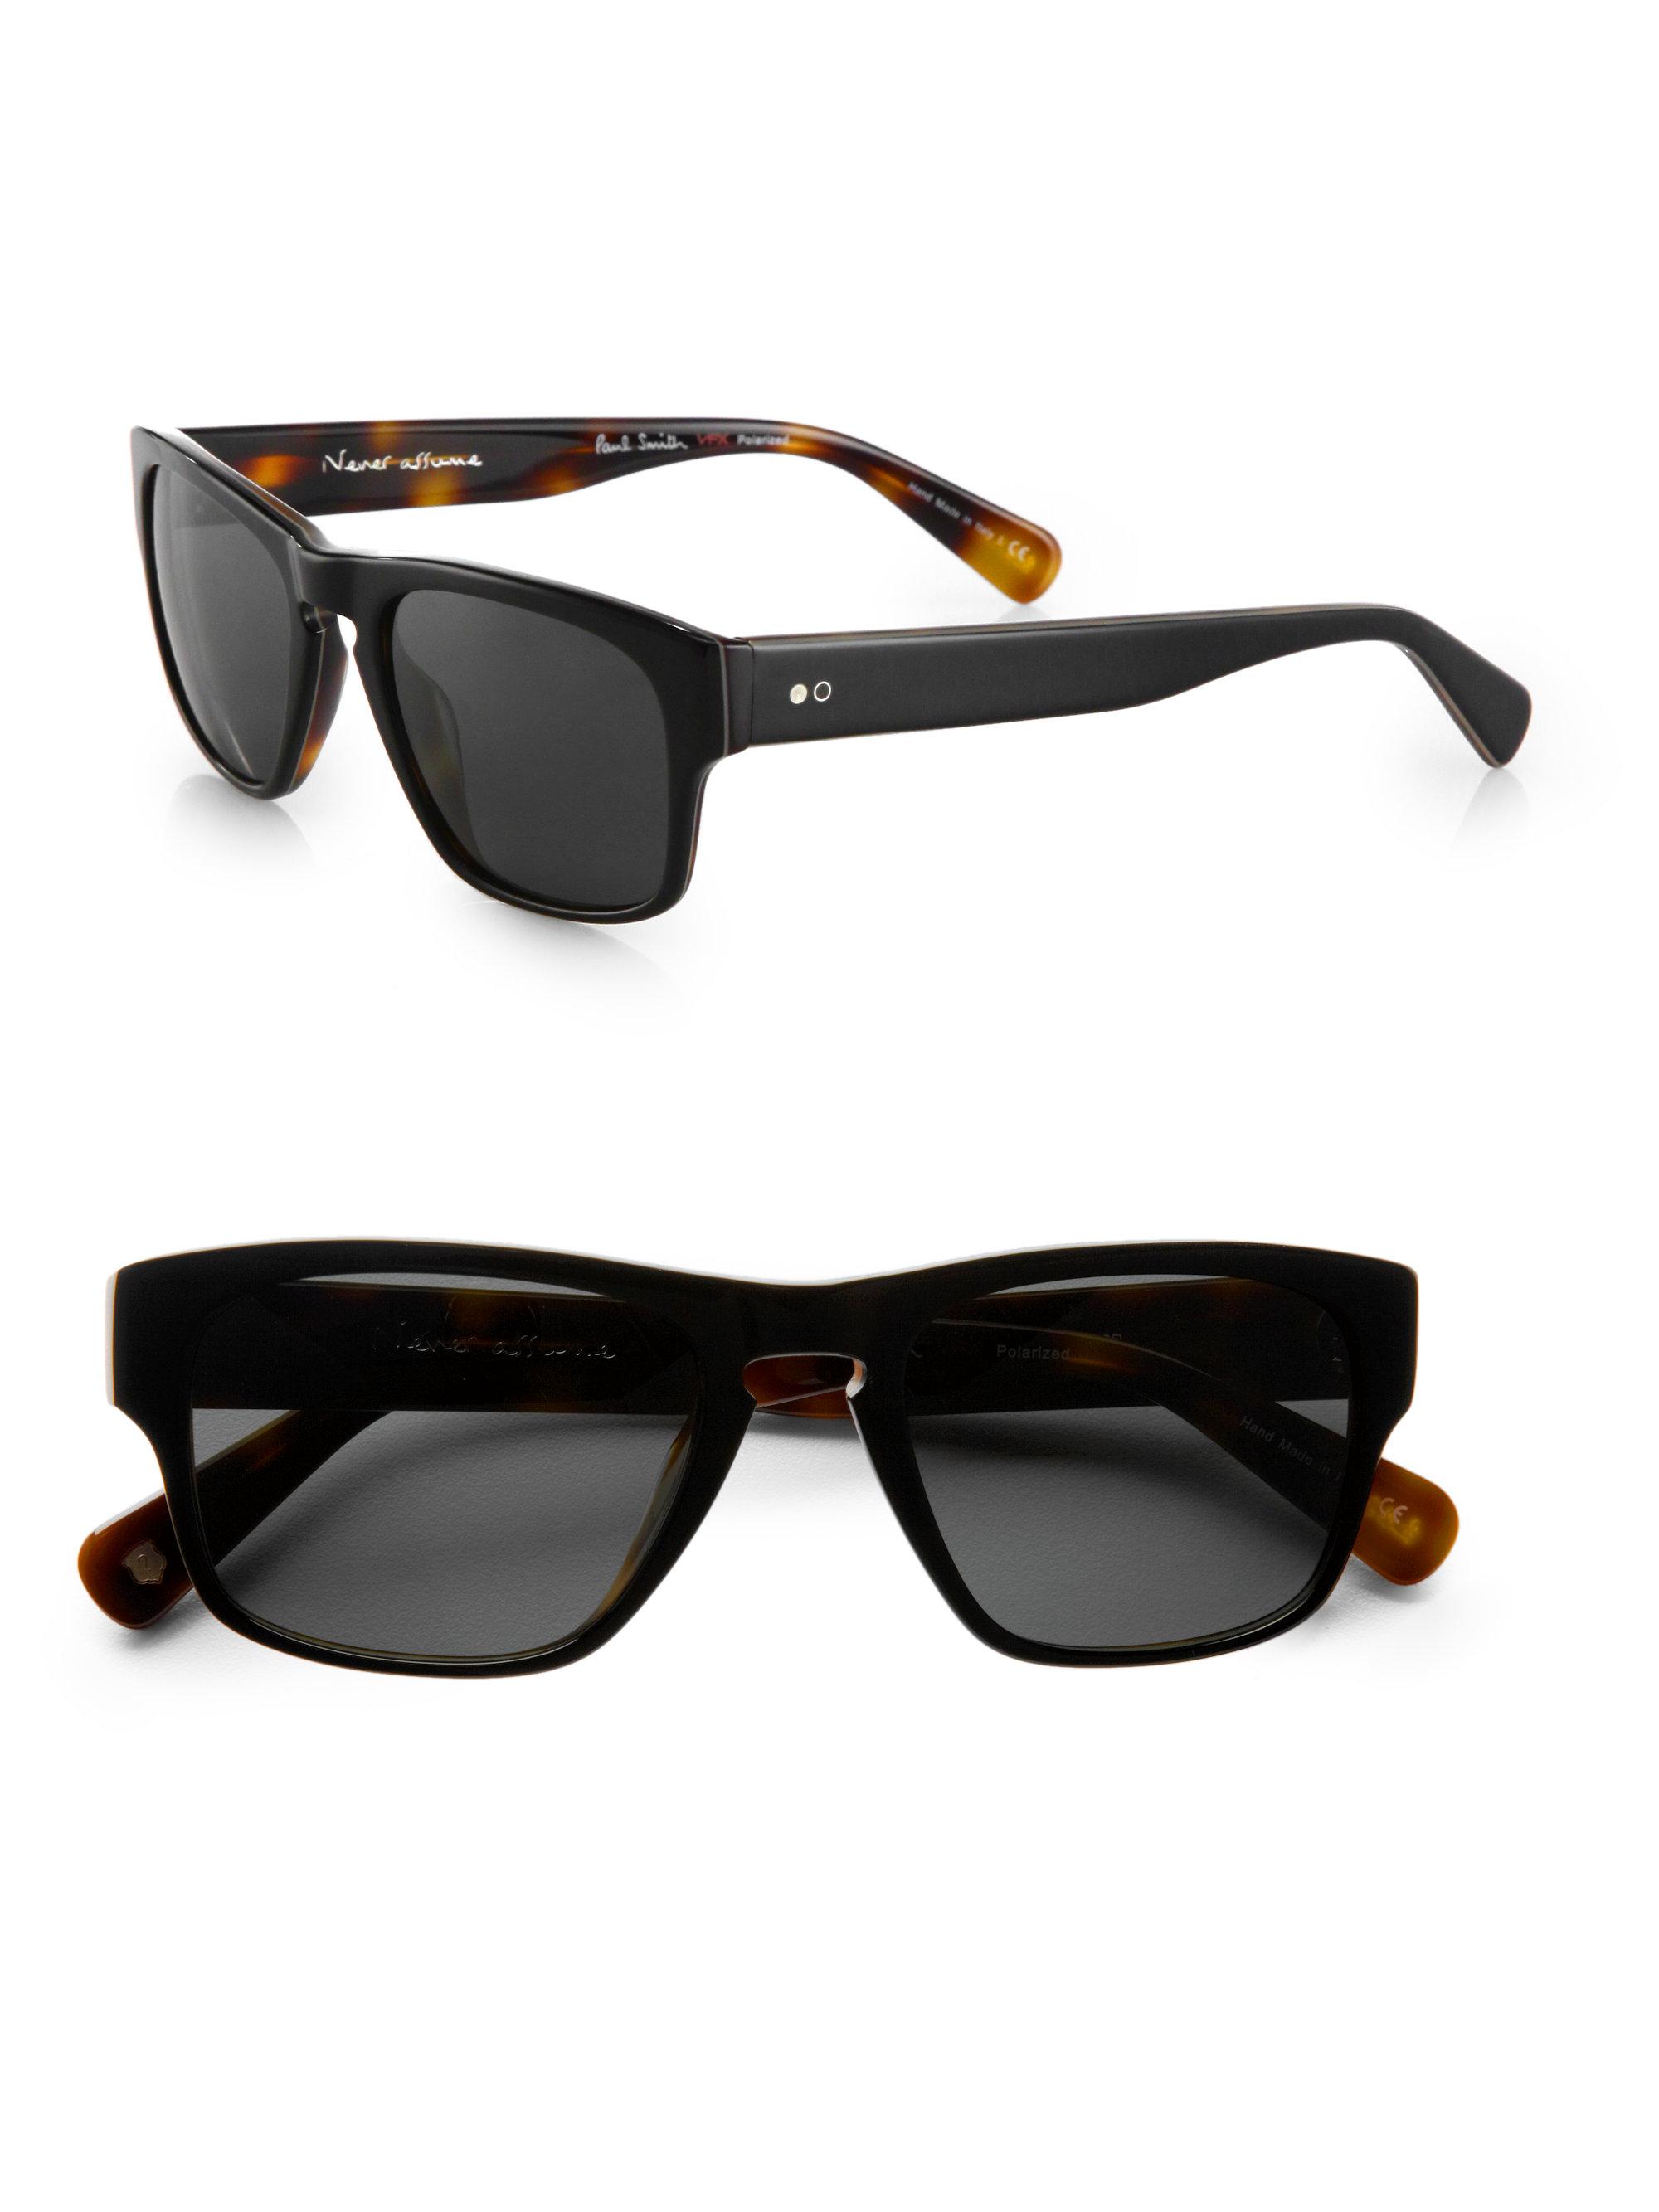 99e5aa021a9 Paul smith Sylus Acetate Sunglasses in Black for Men